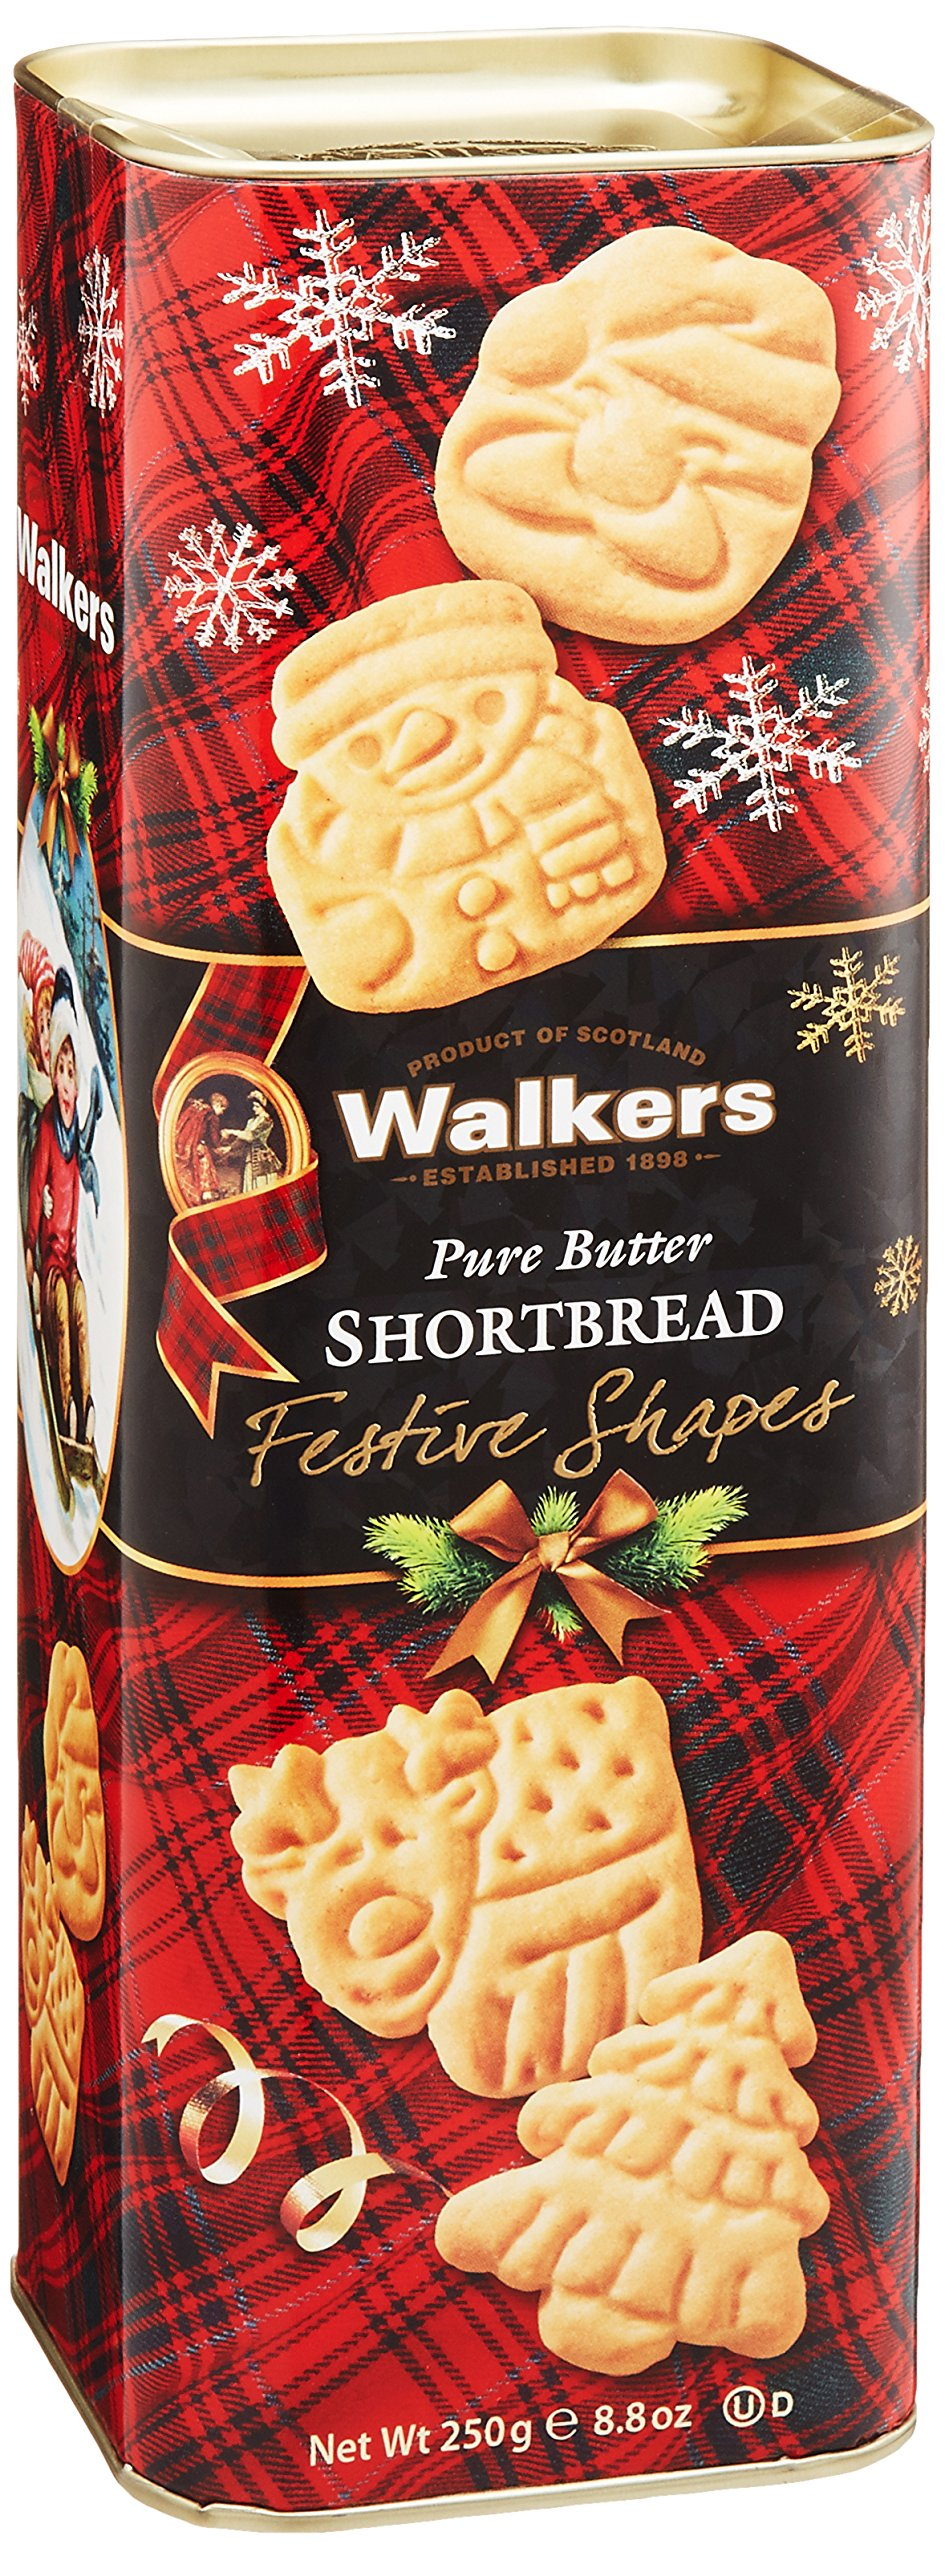 Walkers Shortbread Festive Drums Pure Butter, 8.8 Ounce